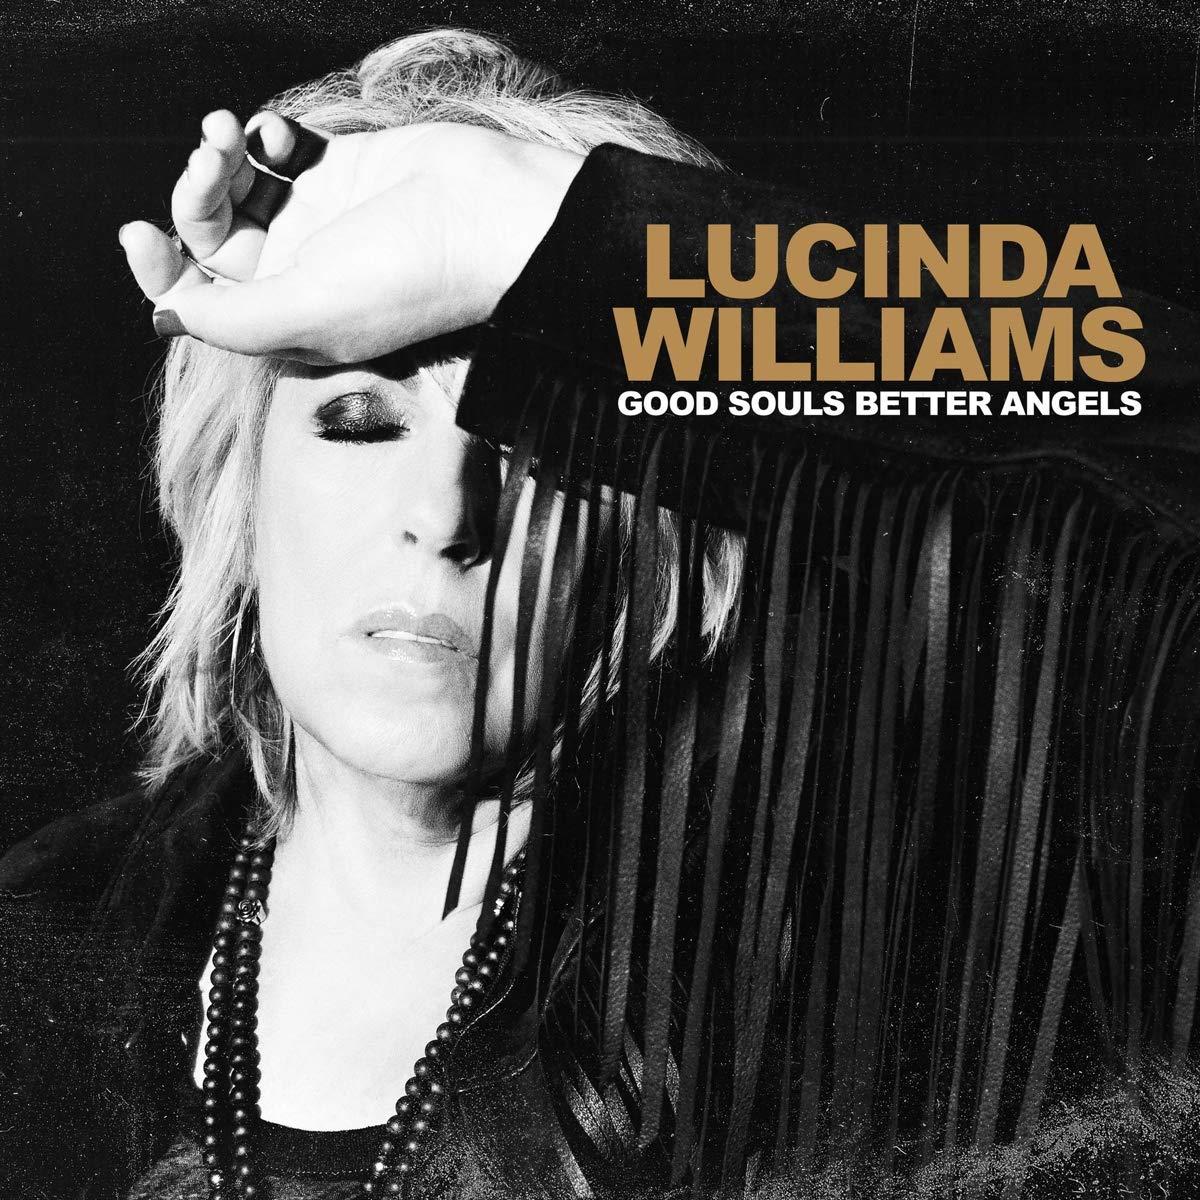 Album Review: Lucinda Williams – Good Souls Better Angels